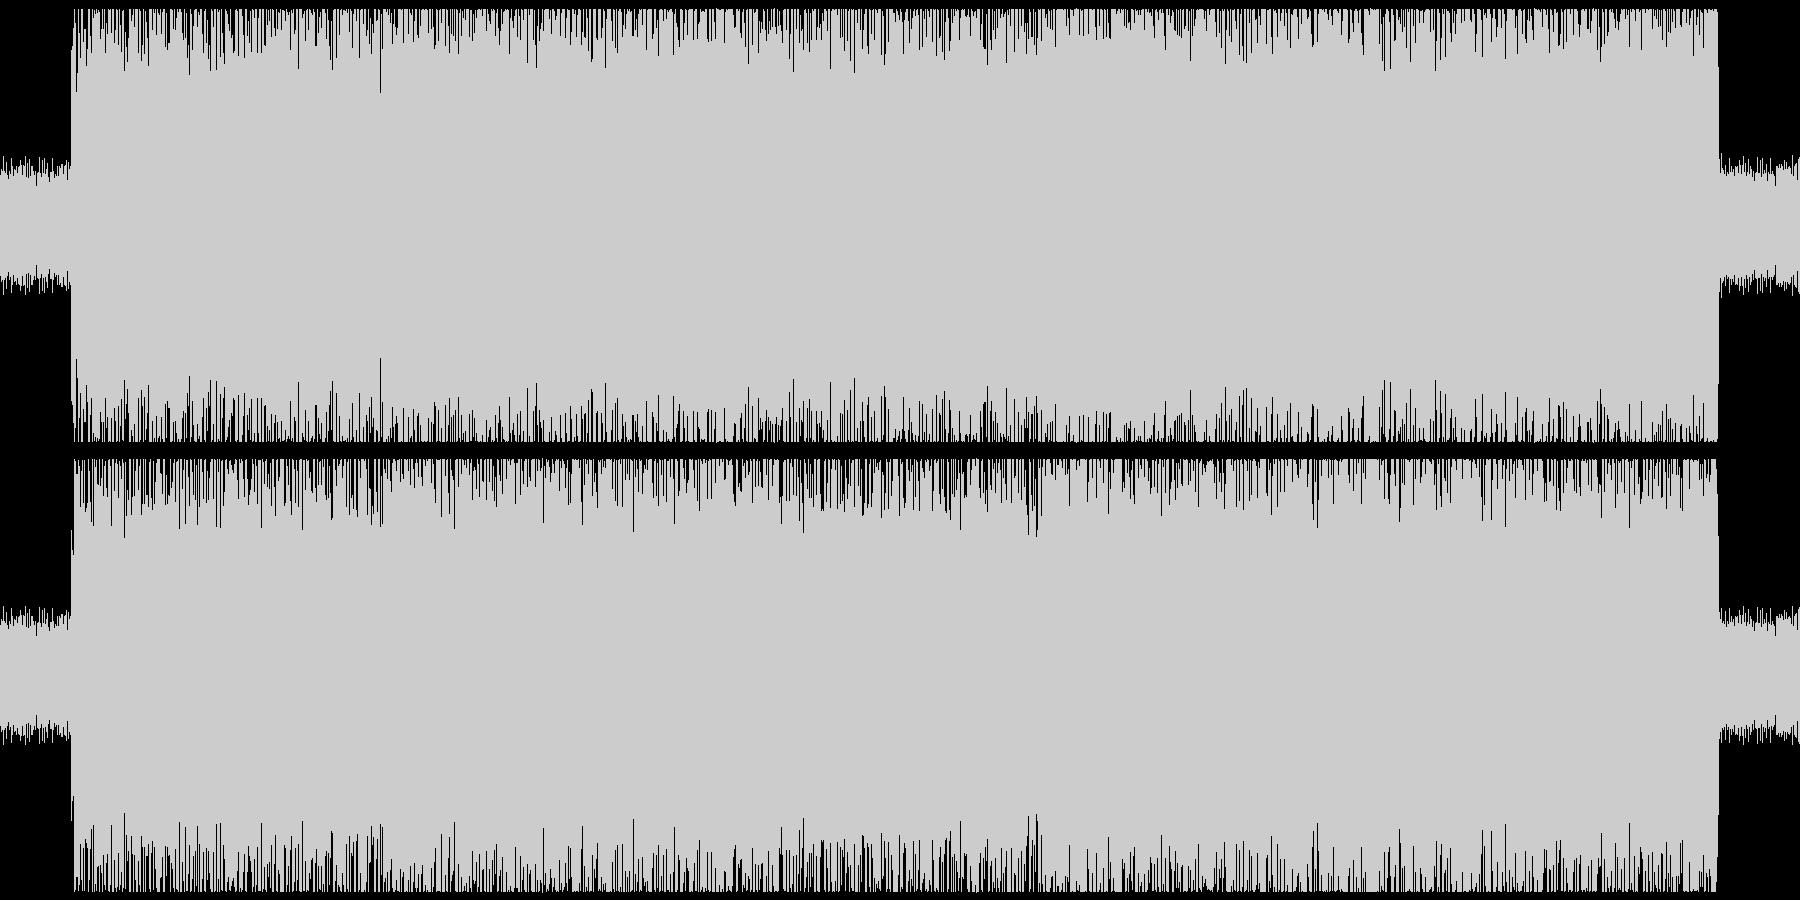 RPG風のどこかチープなメタル系戦闘曲の未再生の波形